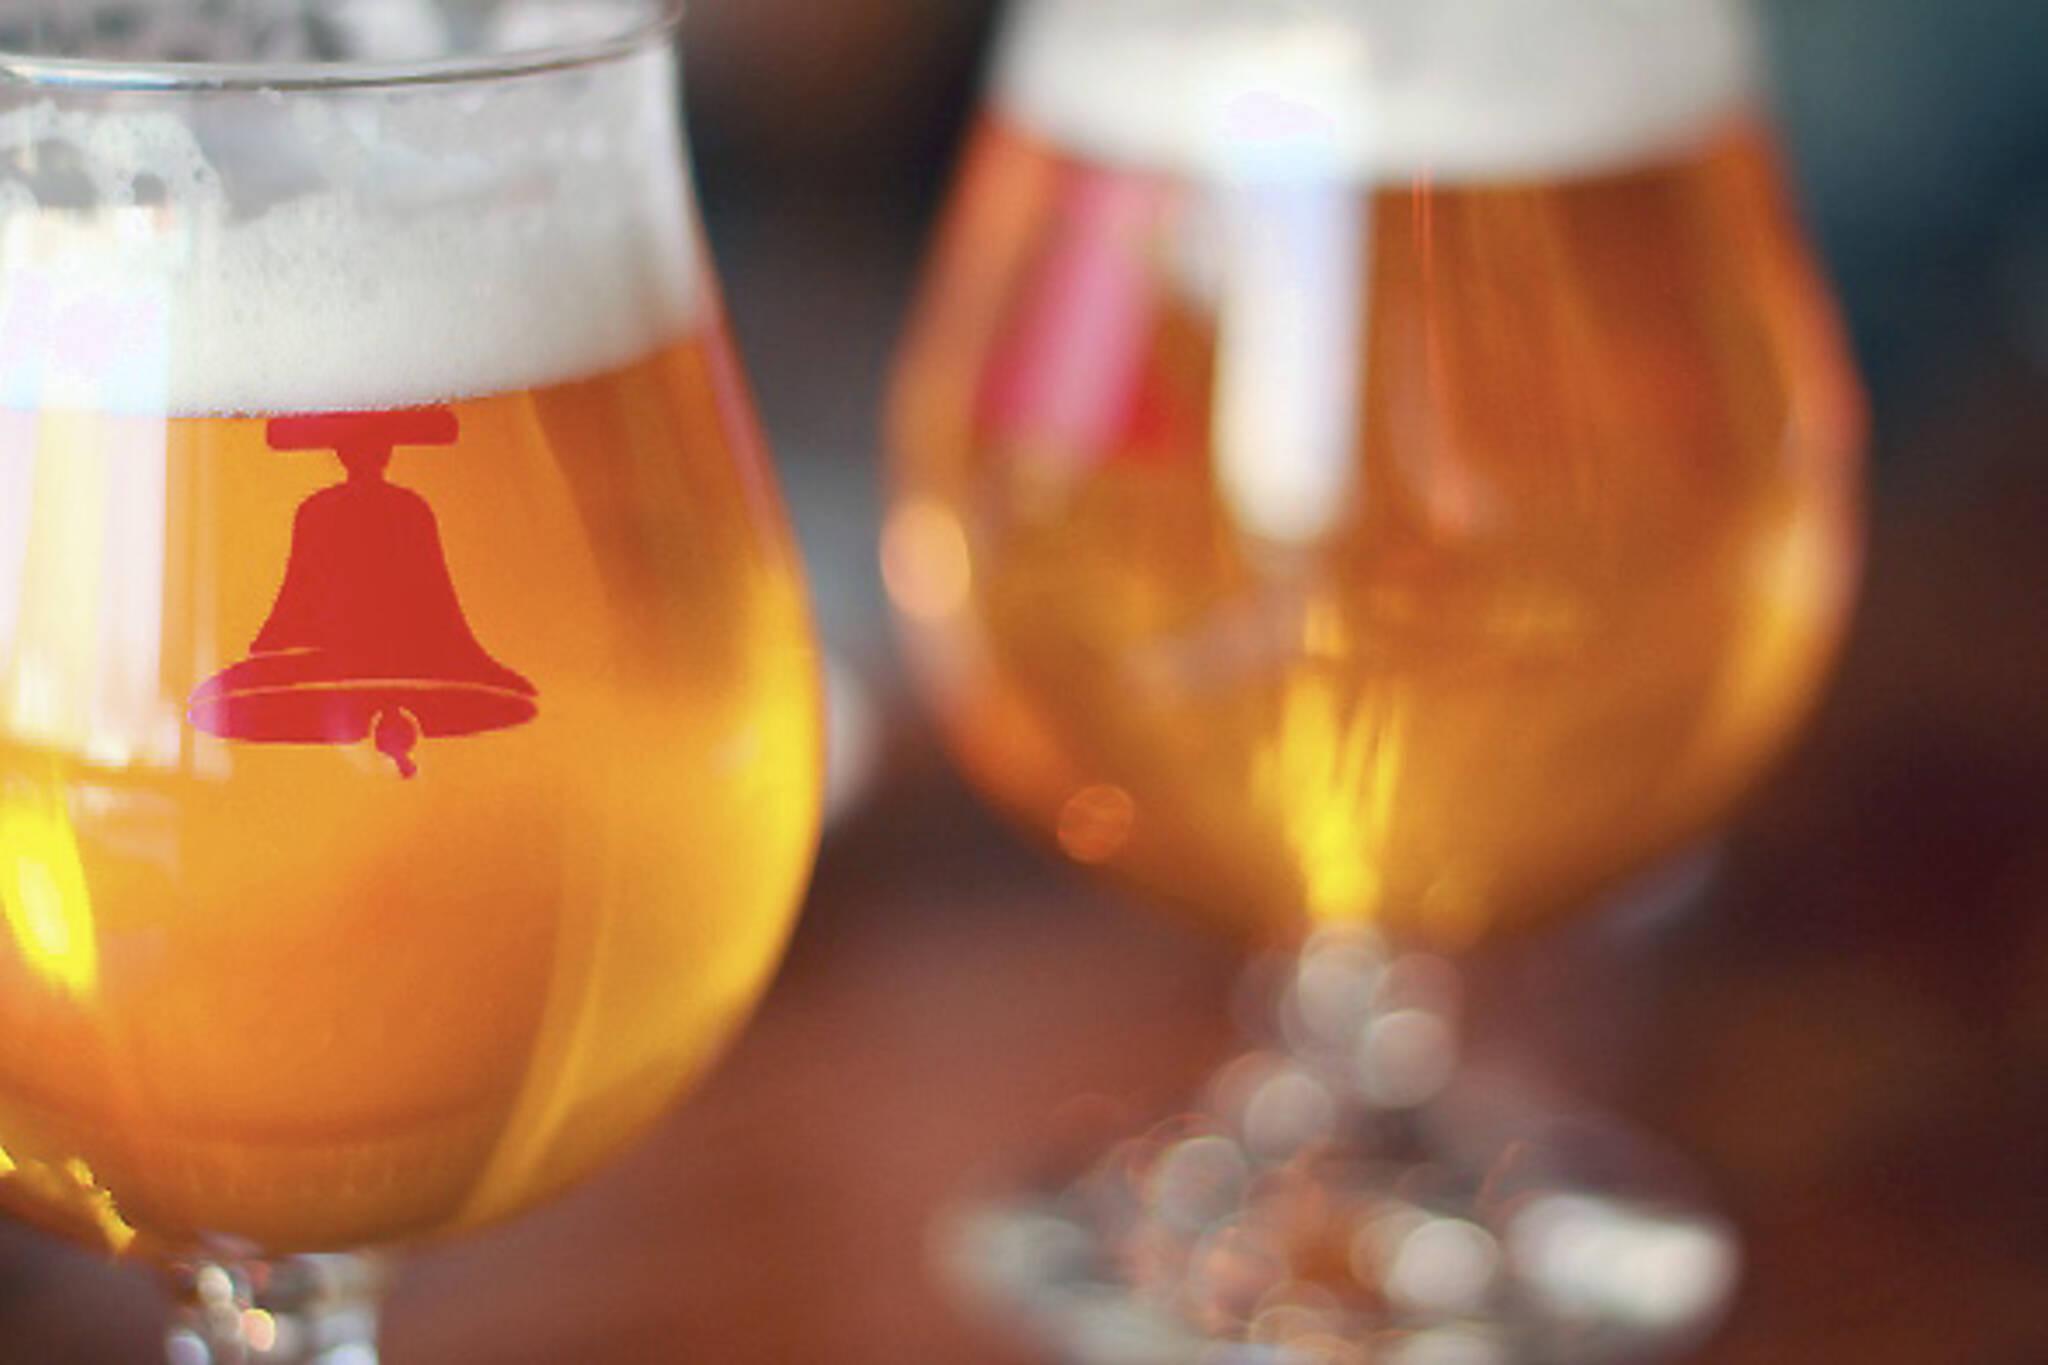 Bellwoods Brewery